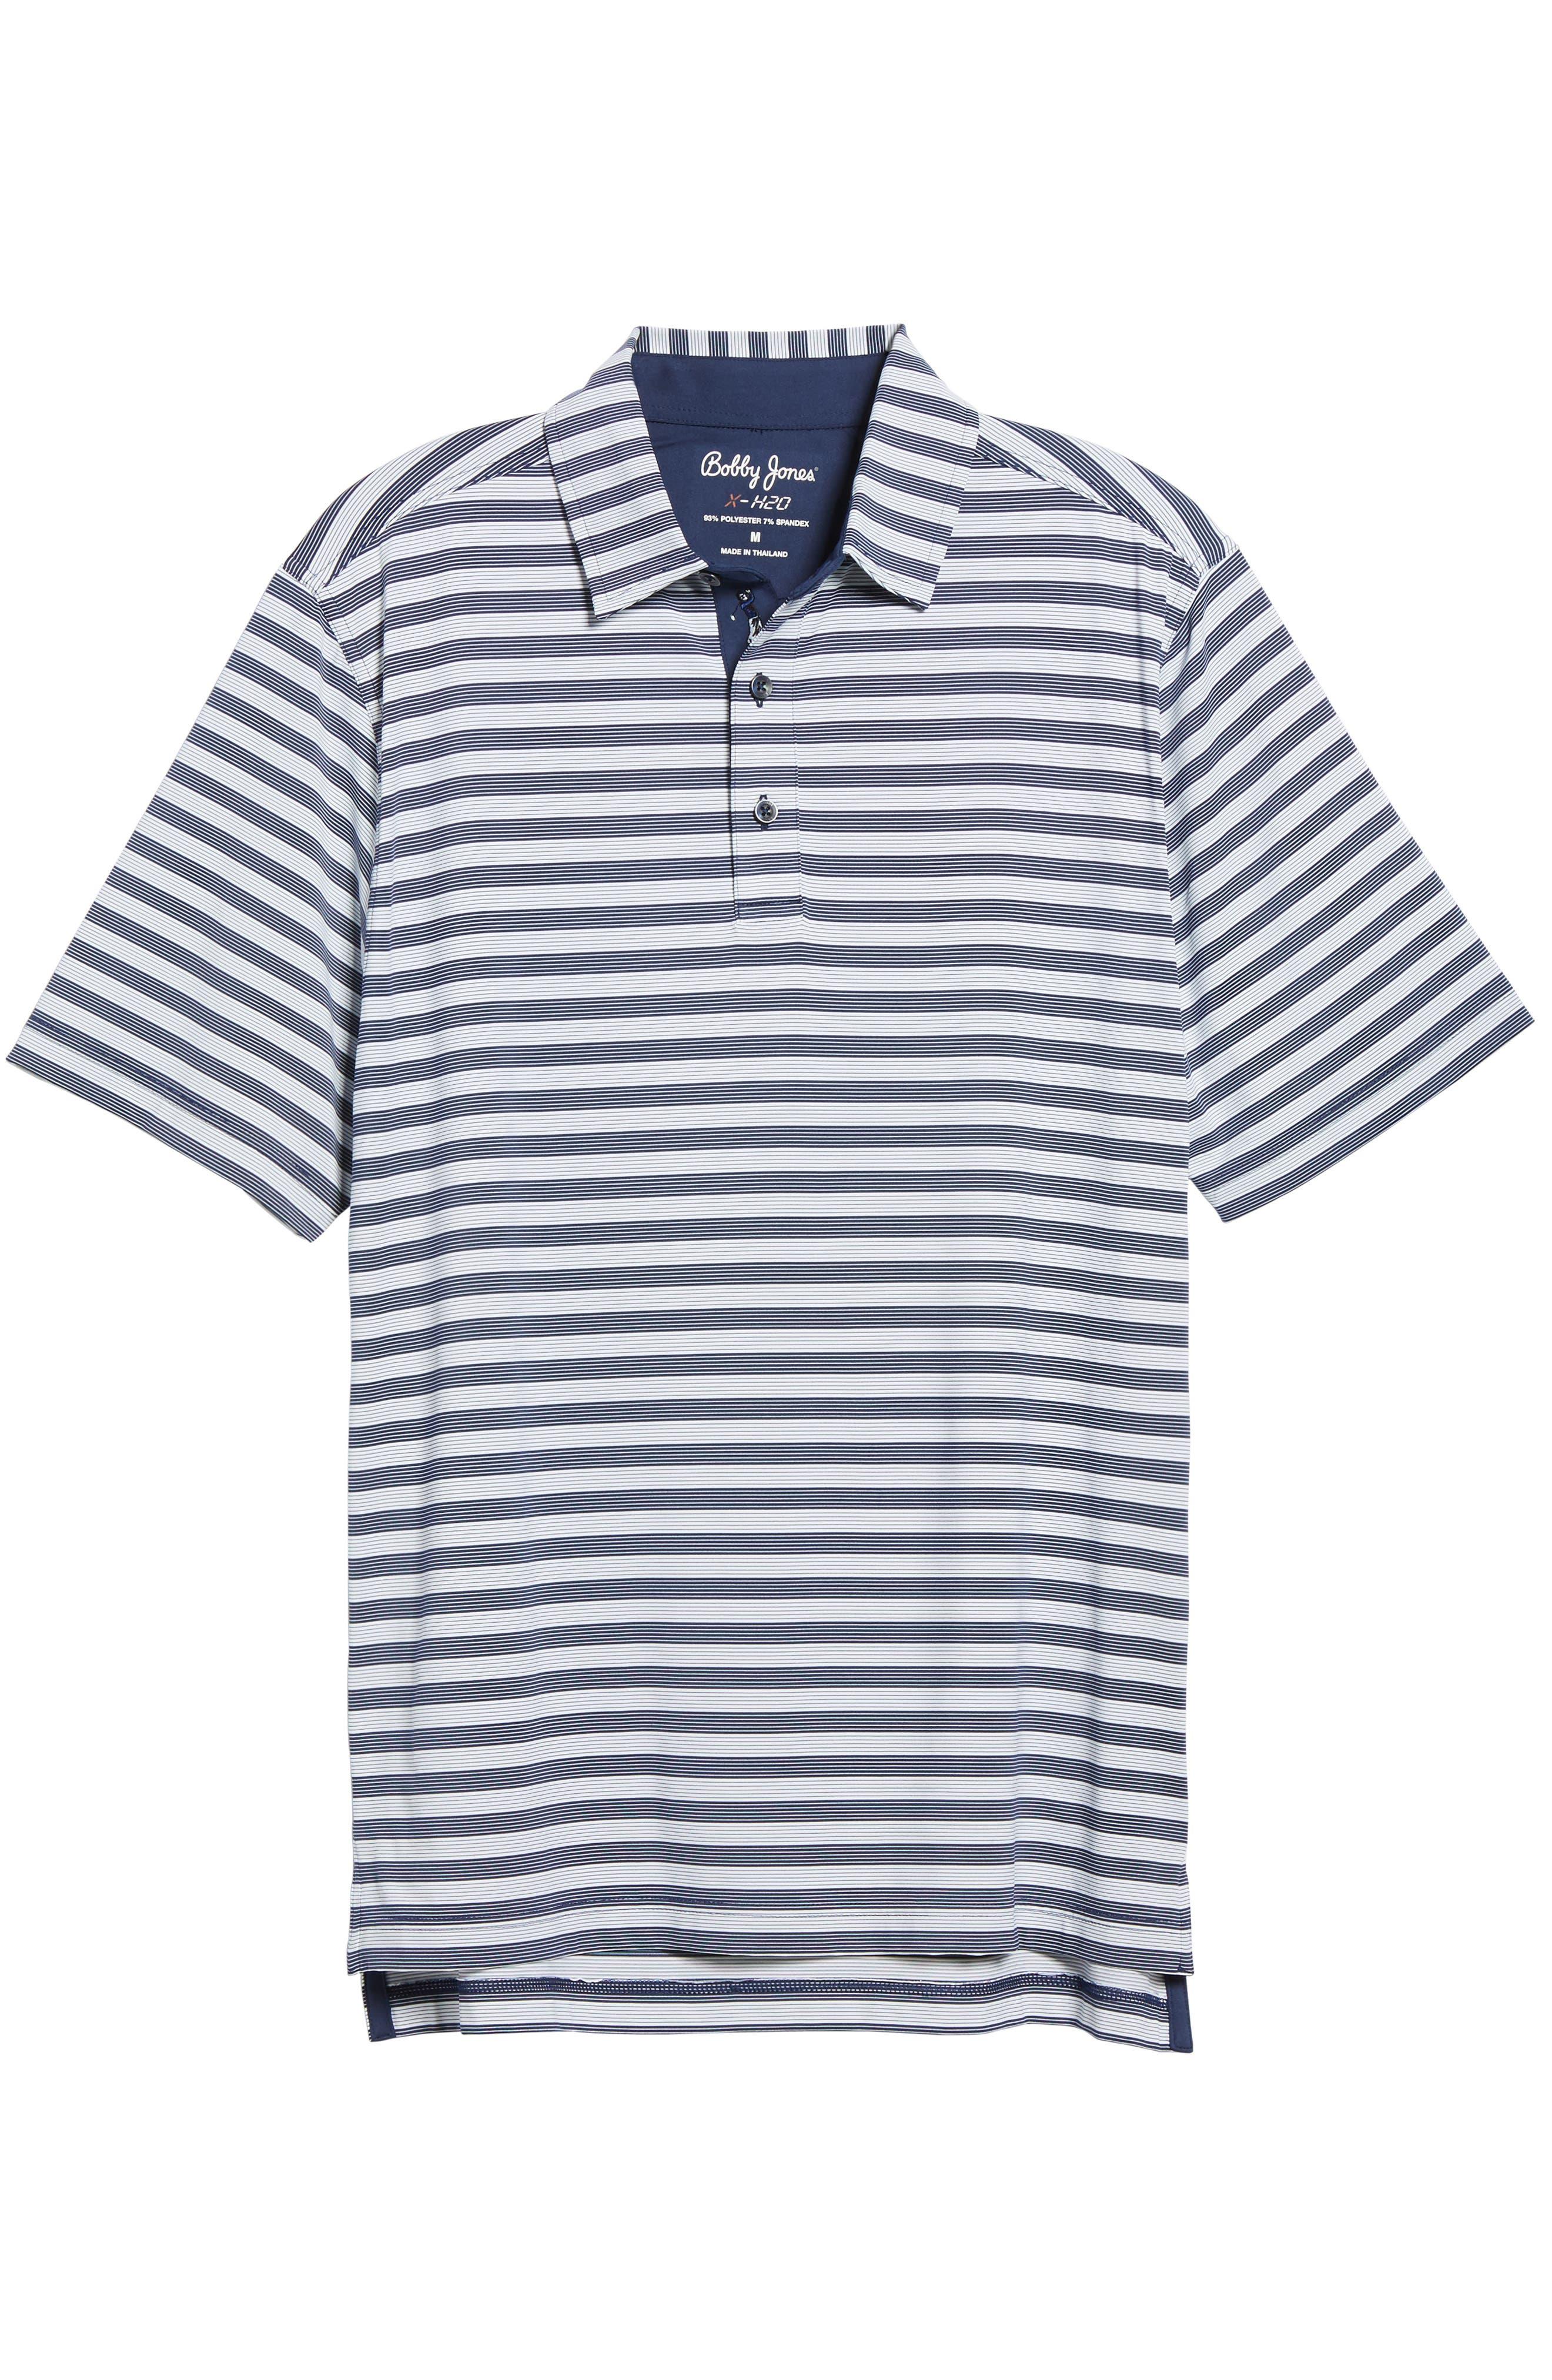 XH2O Del Mar Stripe Jersey Polo,                             Alternate thumbnail 6, color,                             400